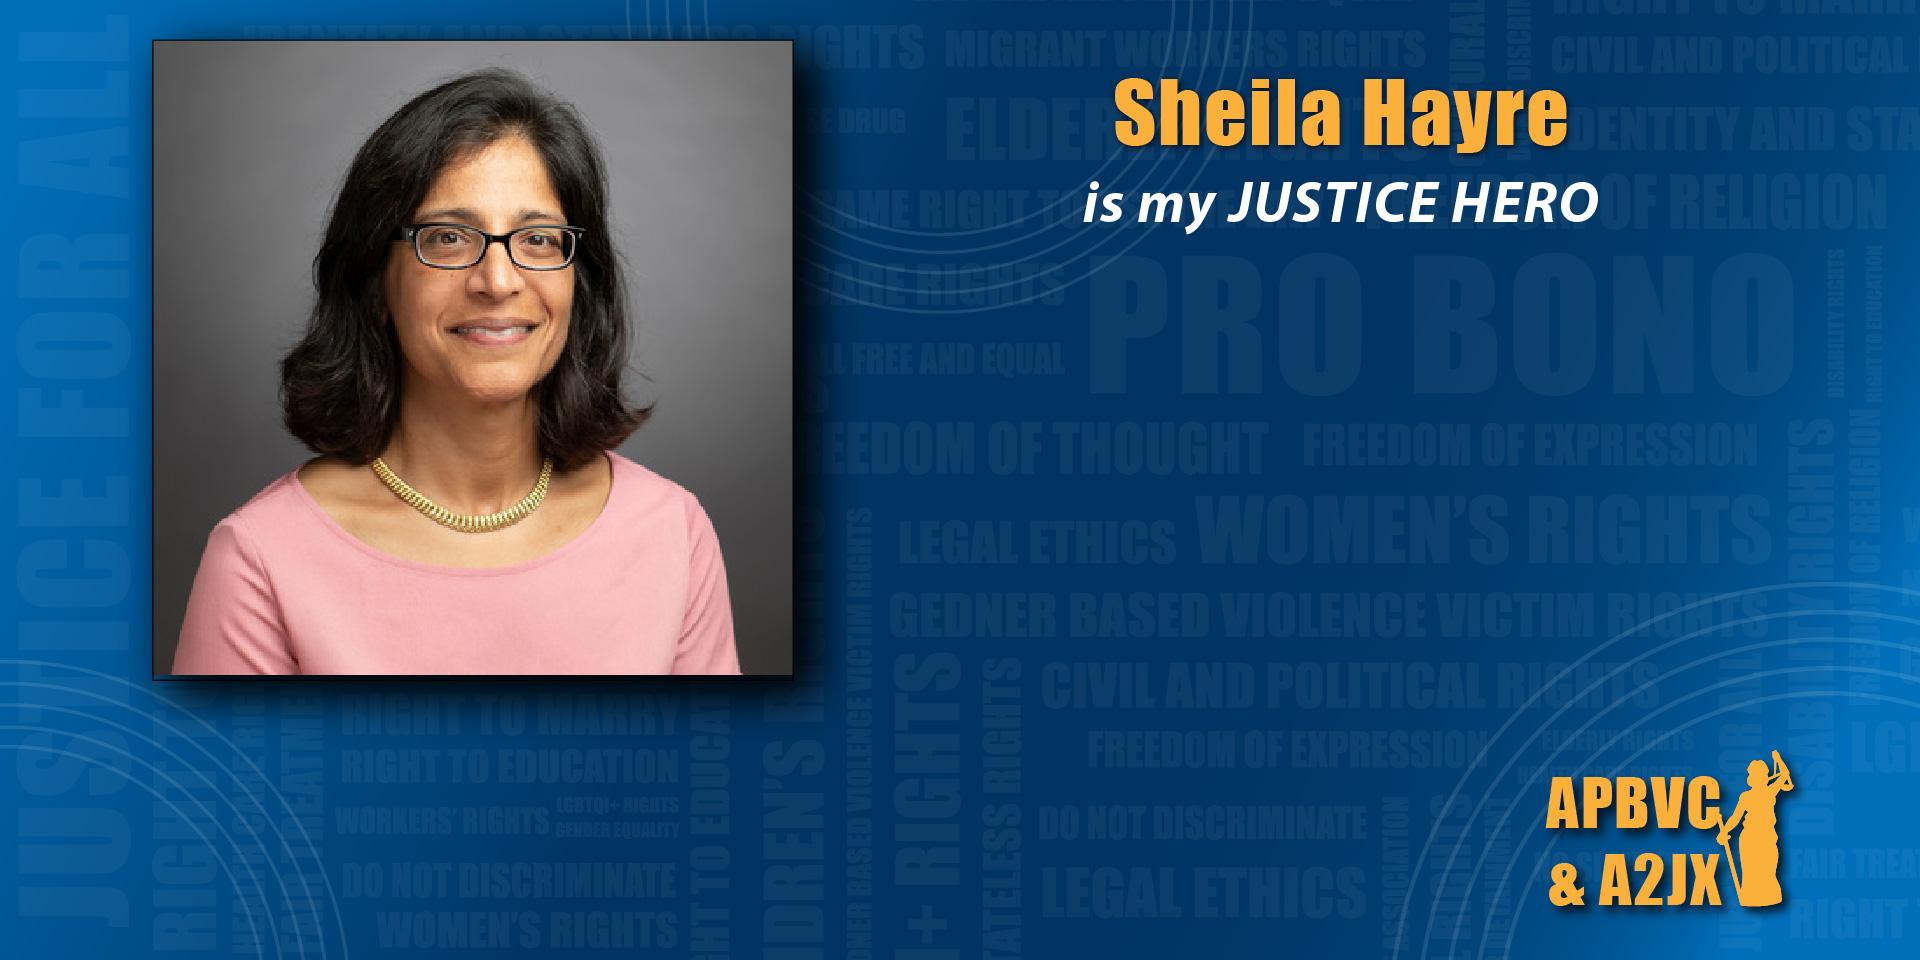 Sheila Hayre